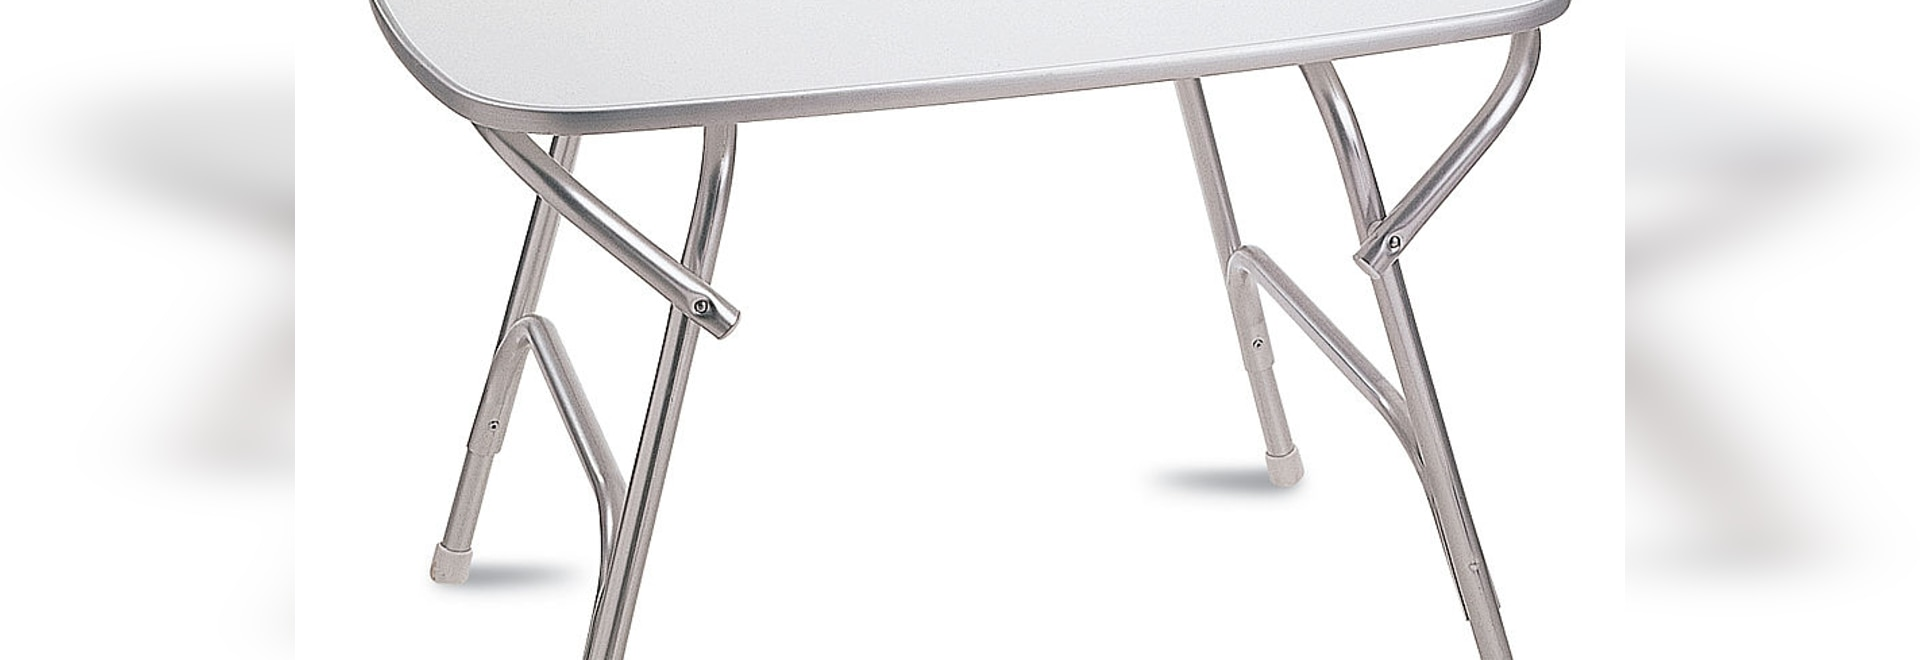 Quality folding Deck Table Marathon Model M450H – New Table Height!!